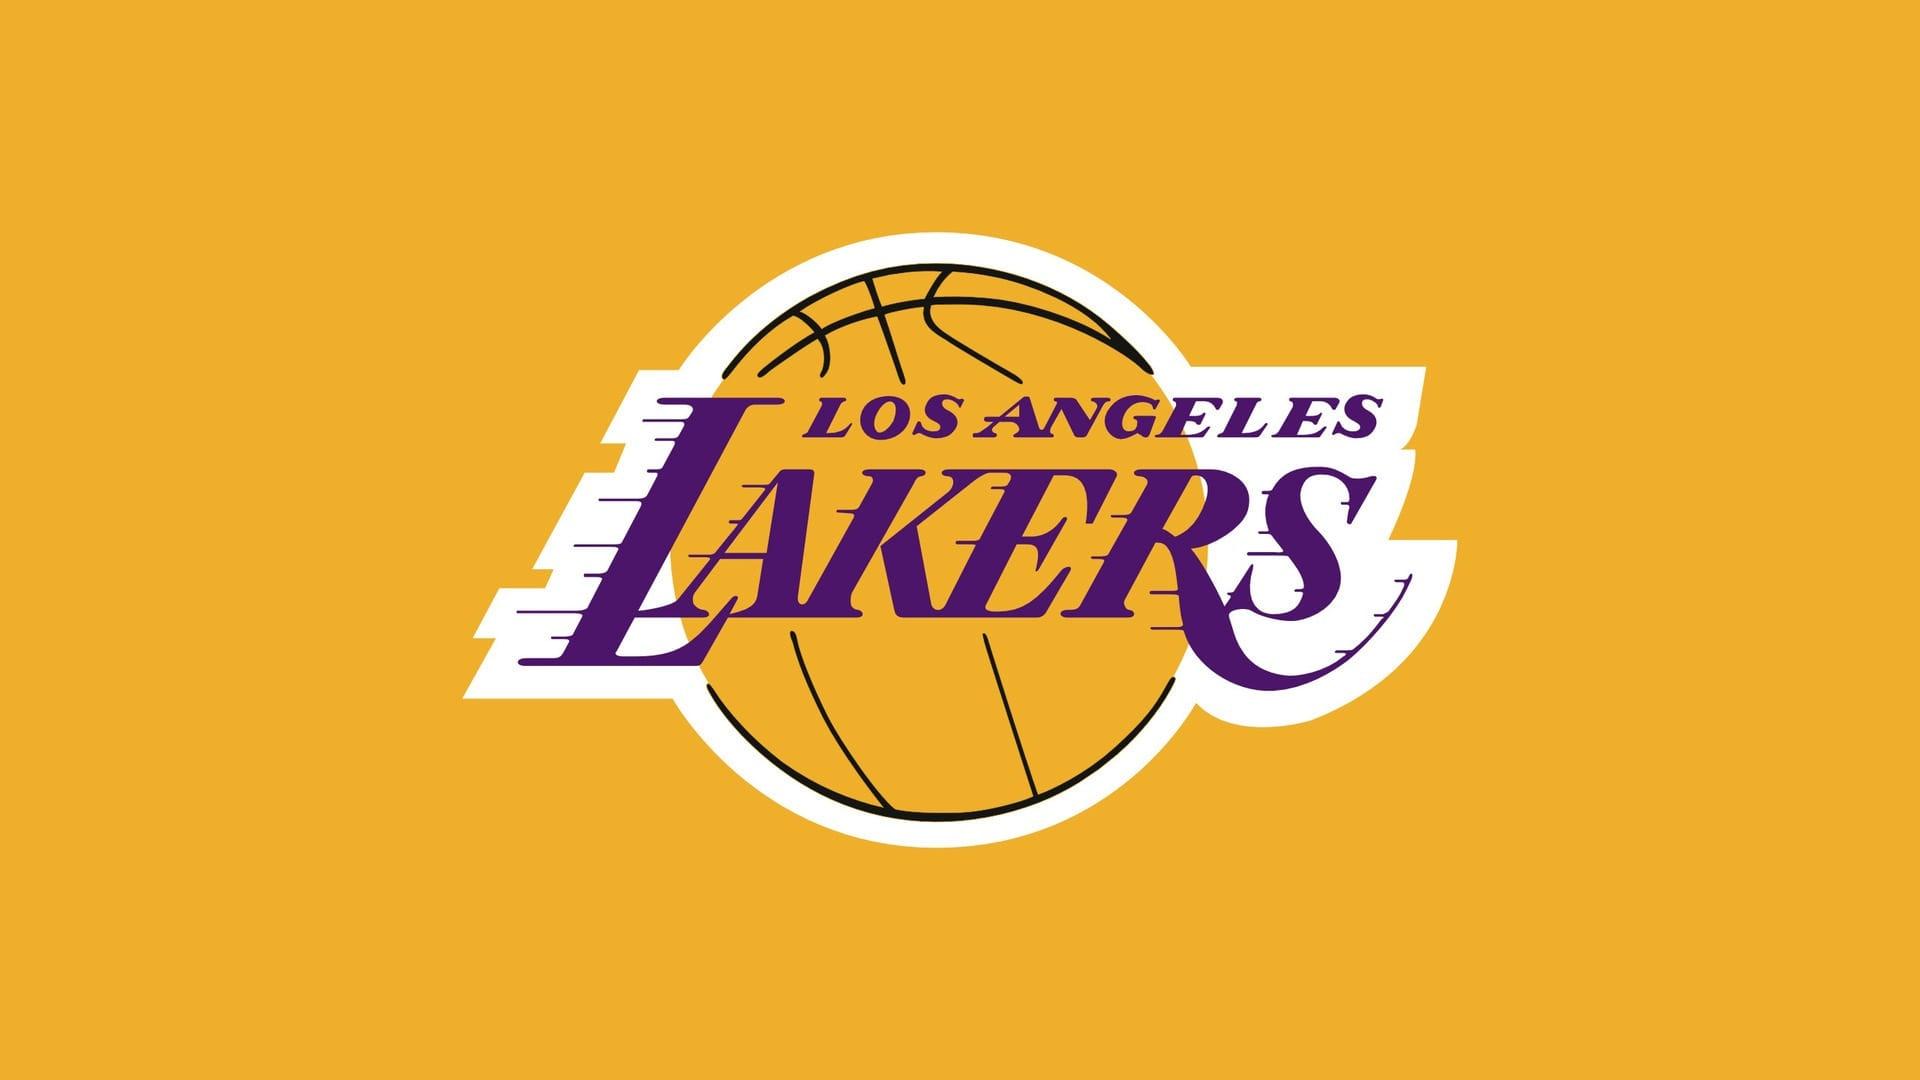 Modnyj rejting klubnyh emblem NBA 22. Los Angeles Lakers